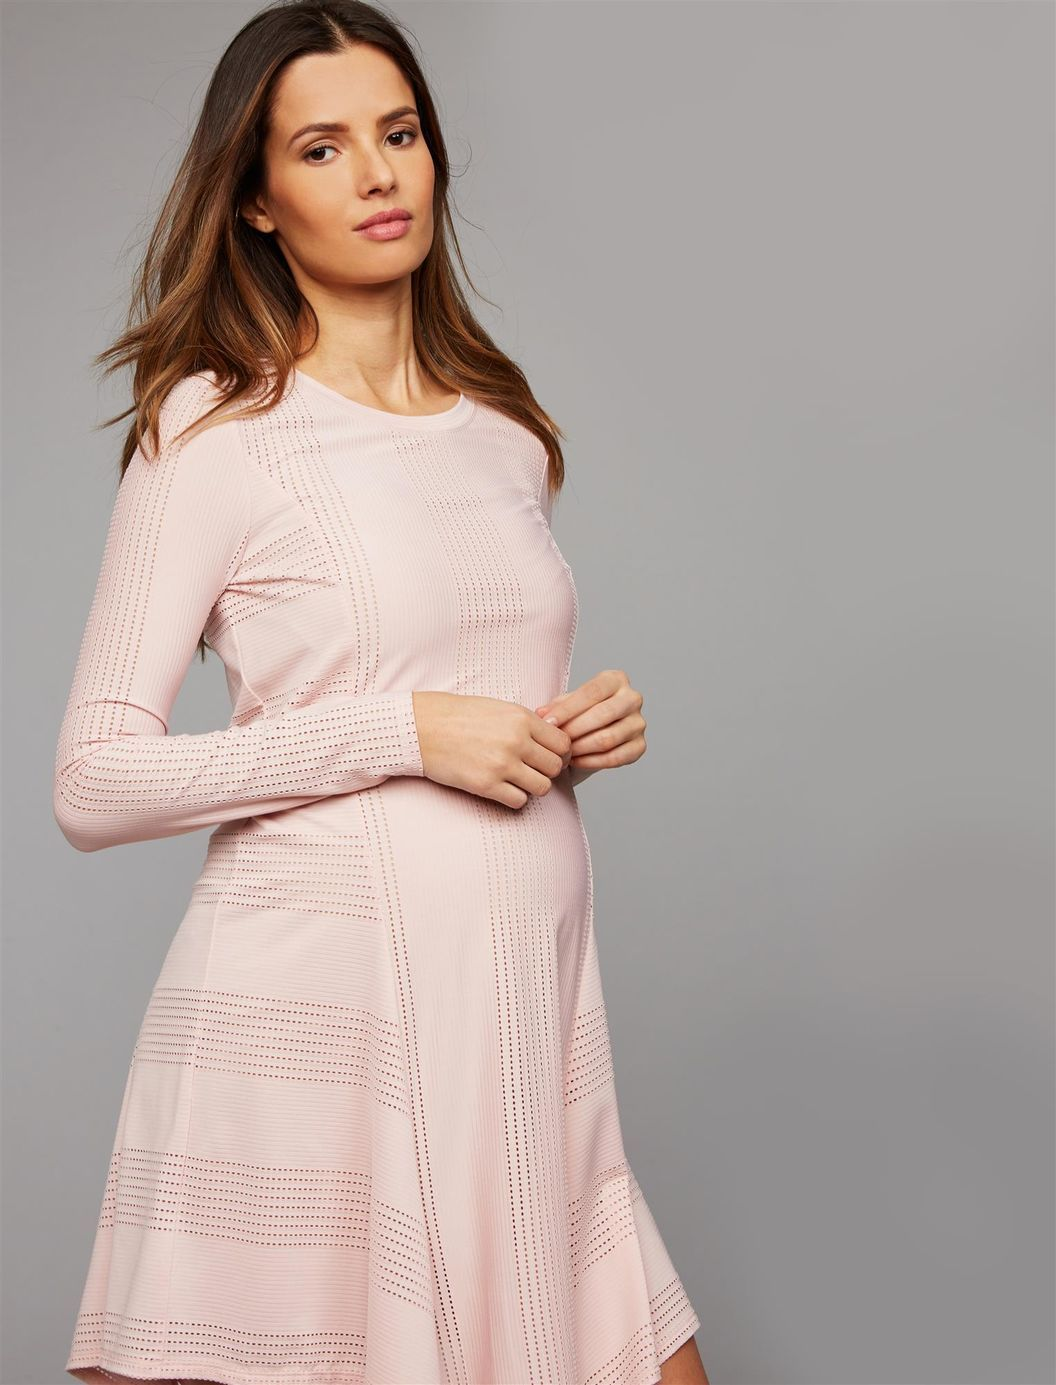 b0a5119f8efe5 BCBGMAXAZRIA Hanky Hem Maternity Dress | A Pea in the Pod Maternity ...